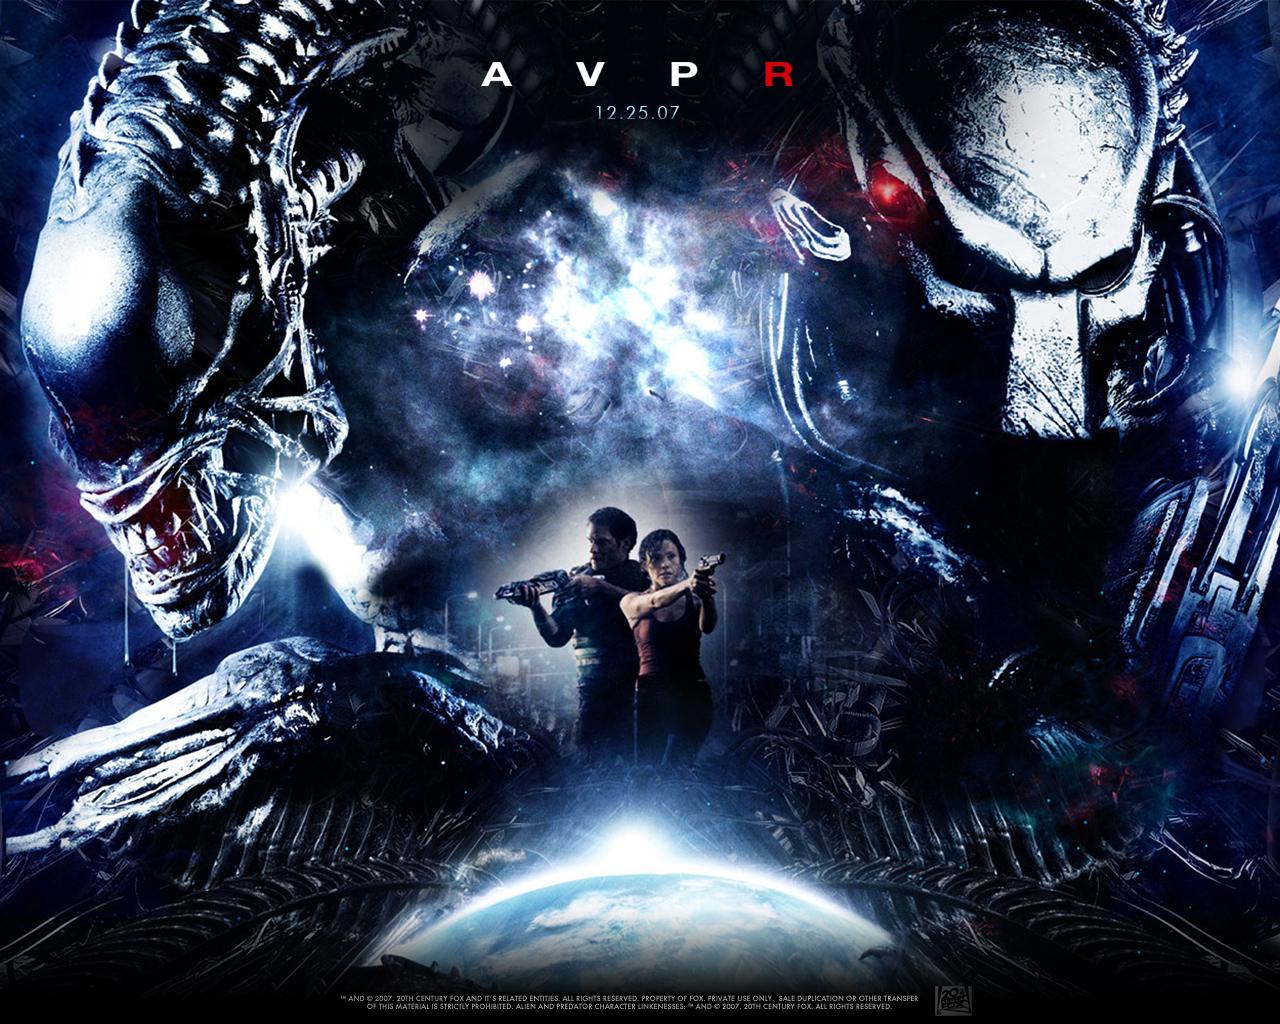 Alien Vs Predator - Playstation 3 Wallpaper (10444027 ...  |Alien Vs Predator Xbox 360 Wallpaper